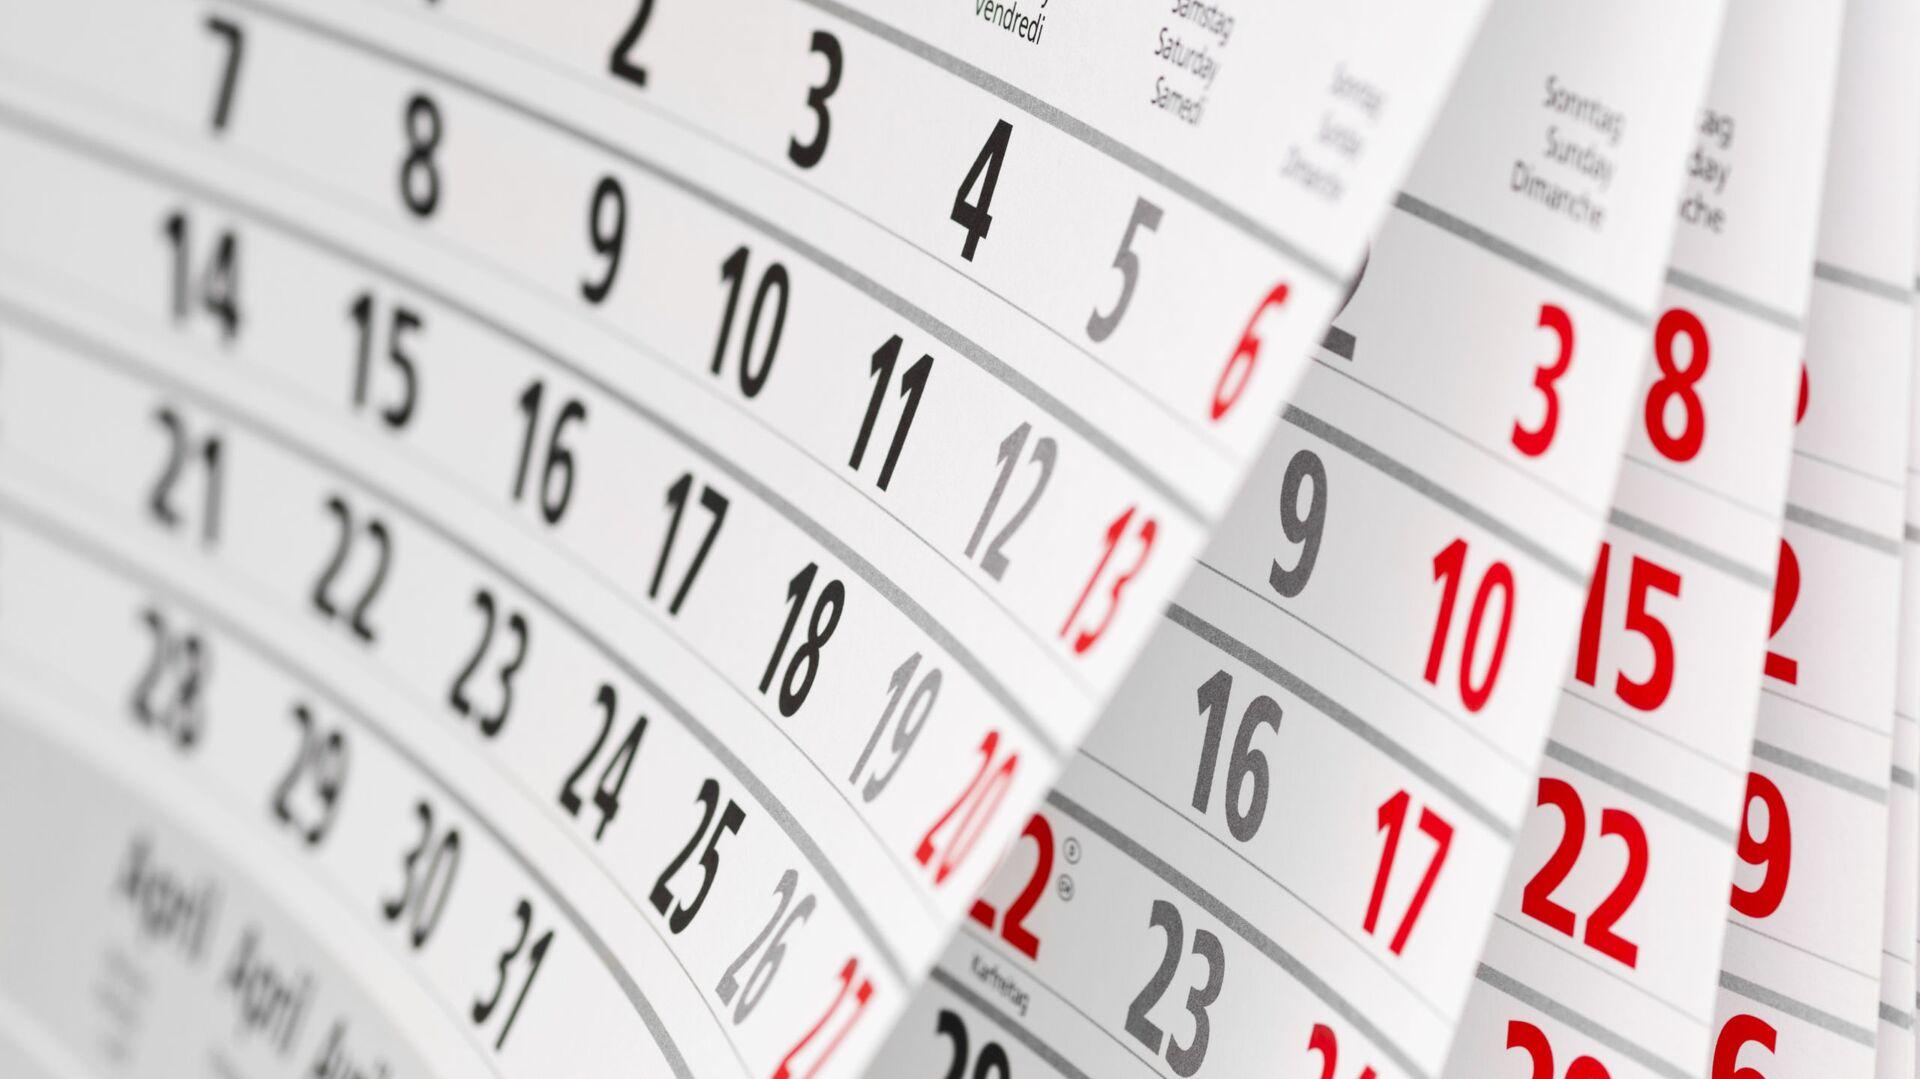 Kalendar s chislami - Sputnik Oʻzbekiston, 1920, 01.08.2021